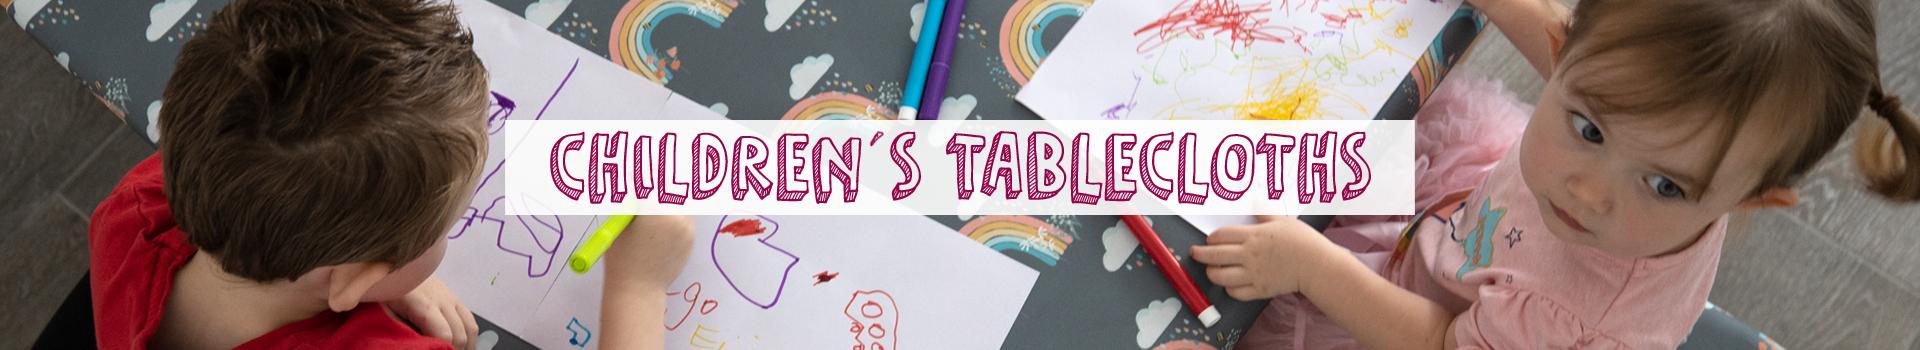 children-s-tablecloths-2.png